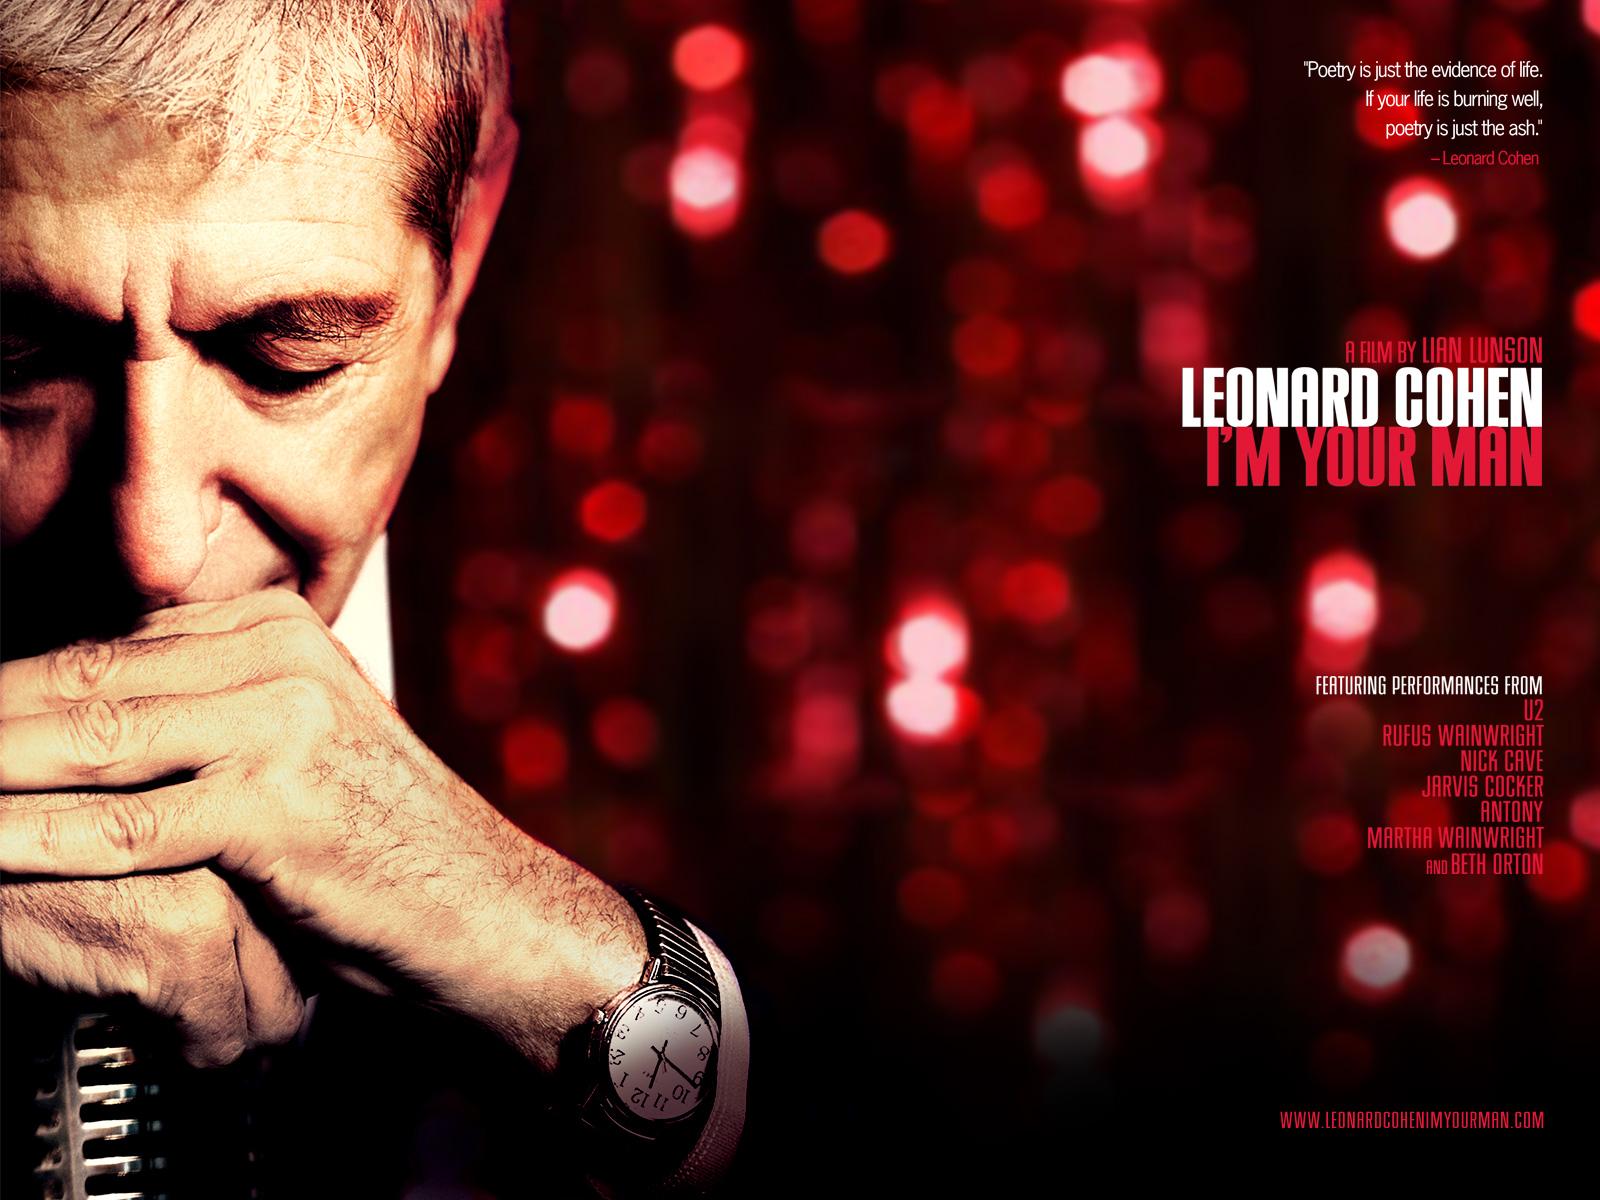 Leonard Cohen in Leonard Cohen: Im Your Man